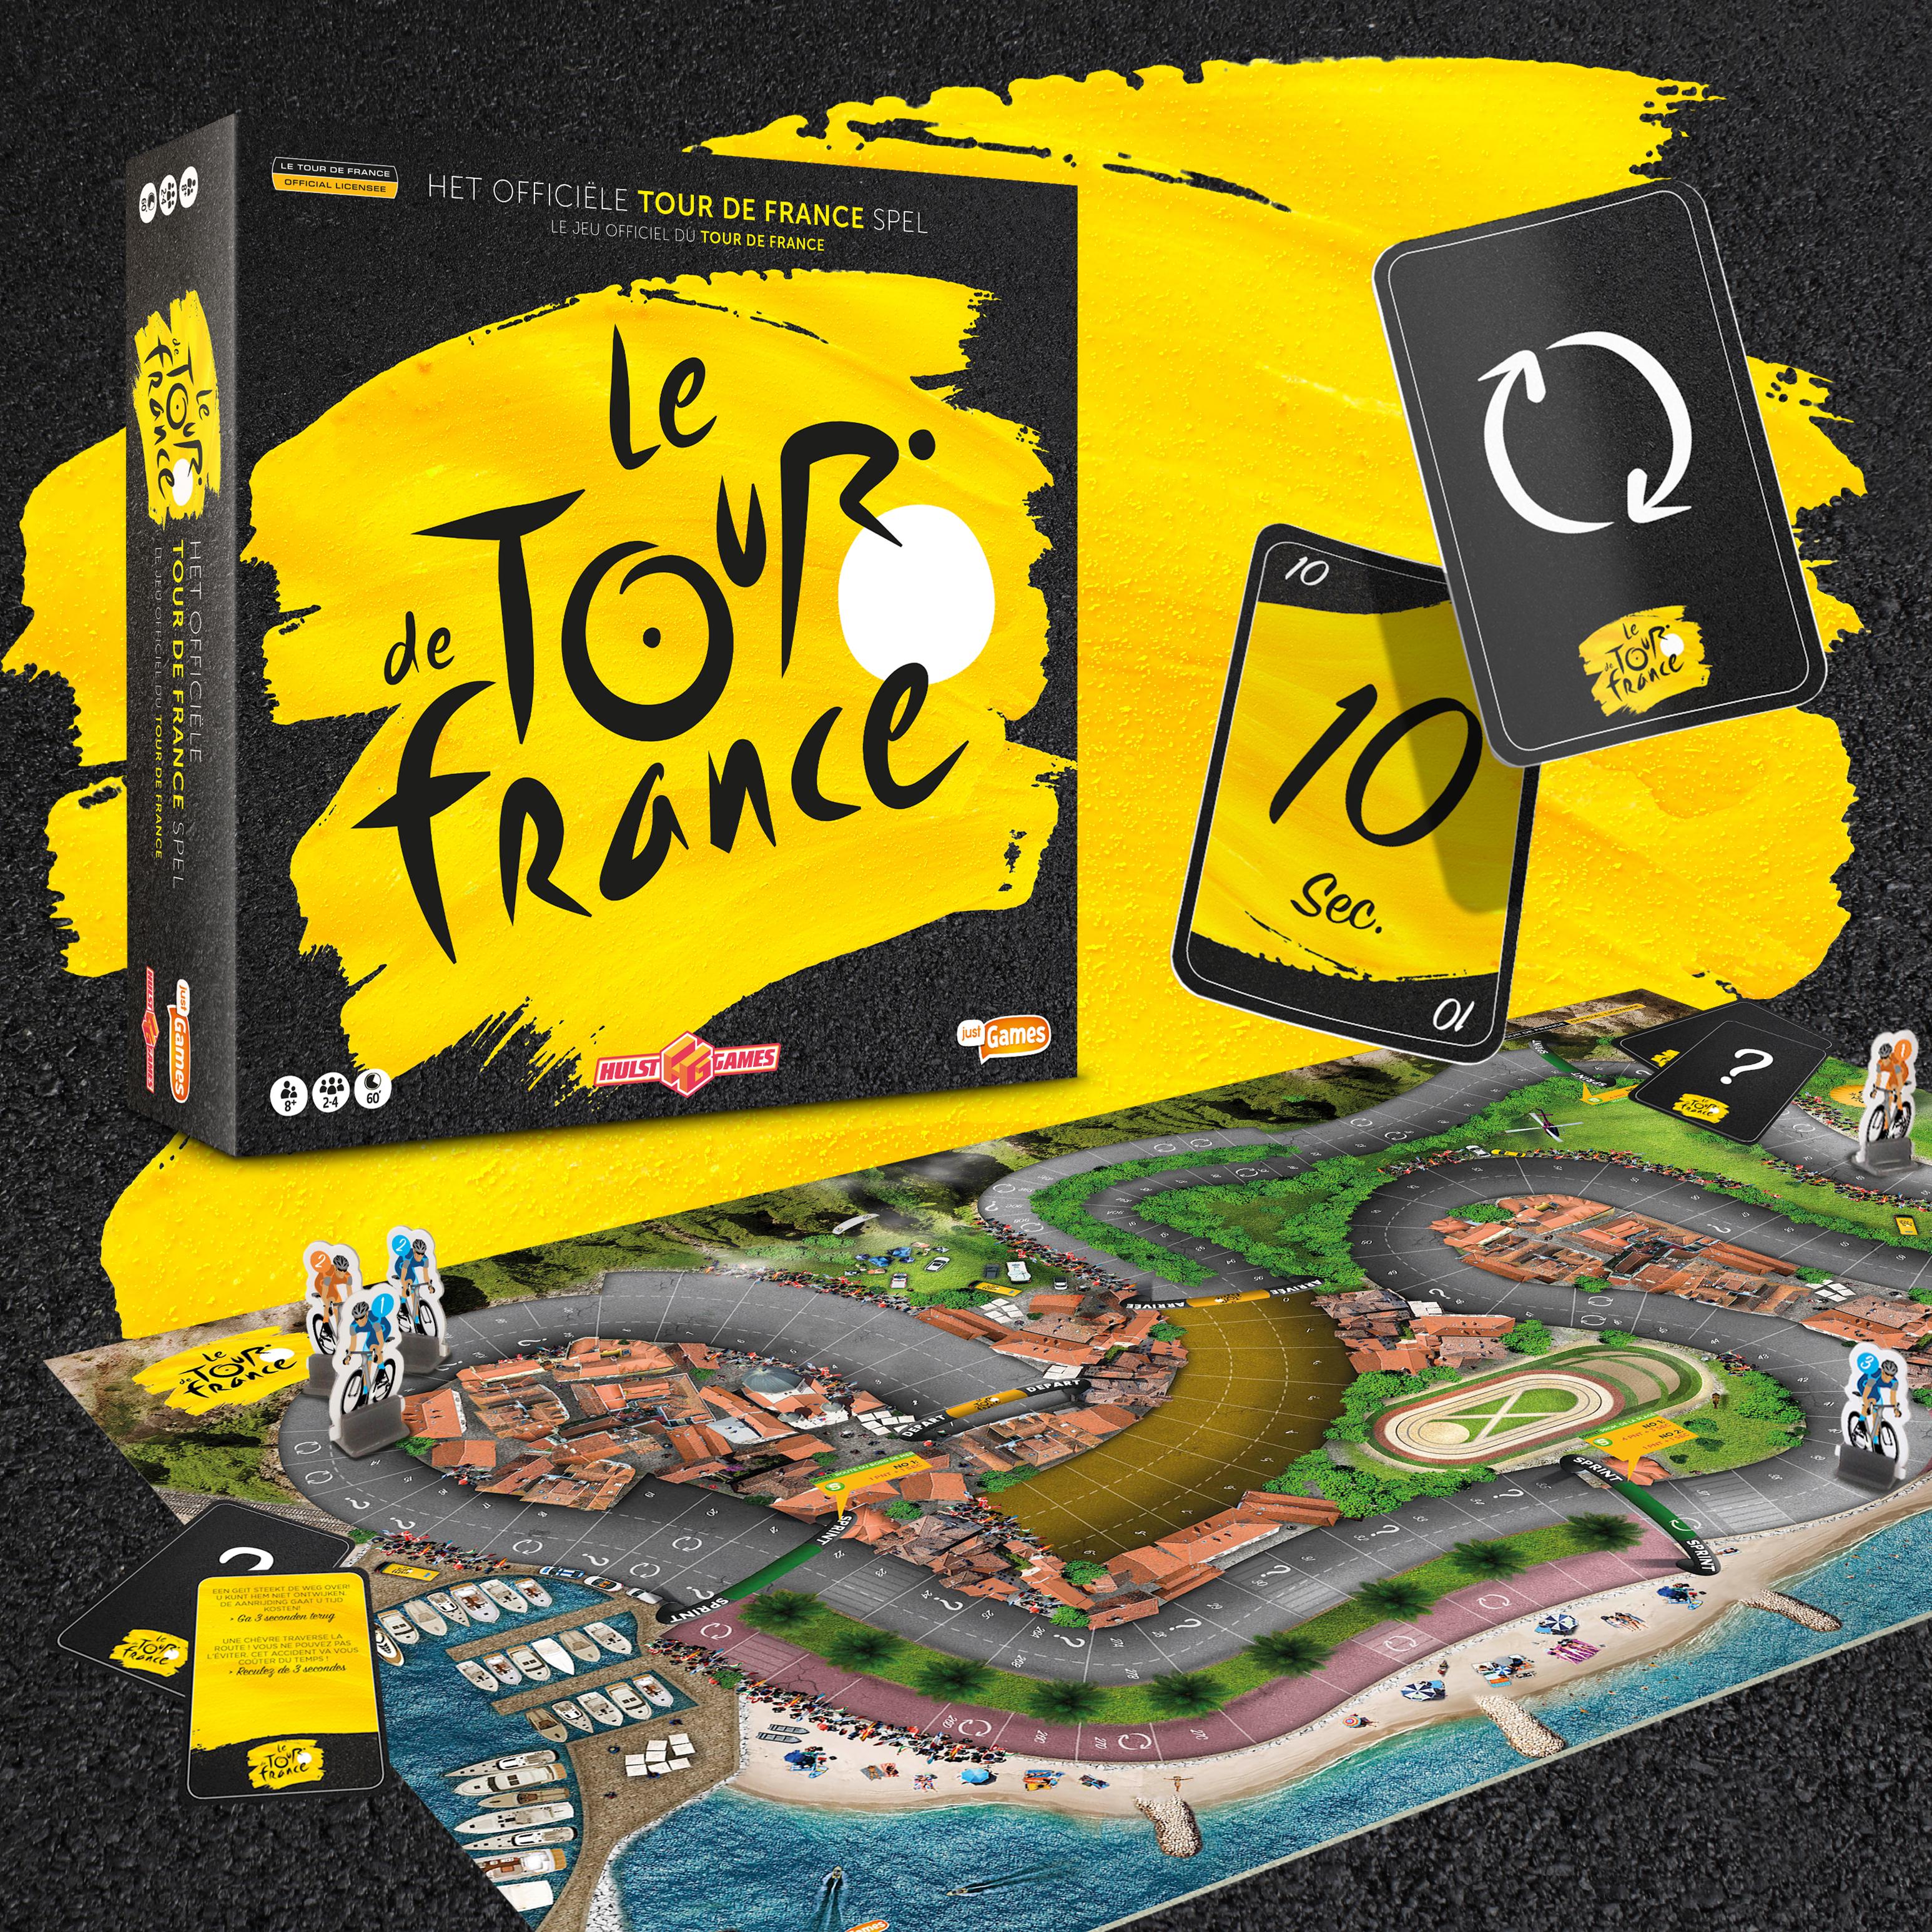 TourDeFrance-Retail-spelopzet_3D